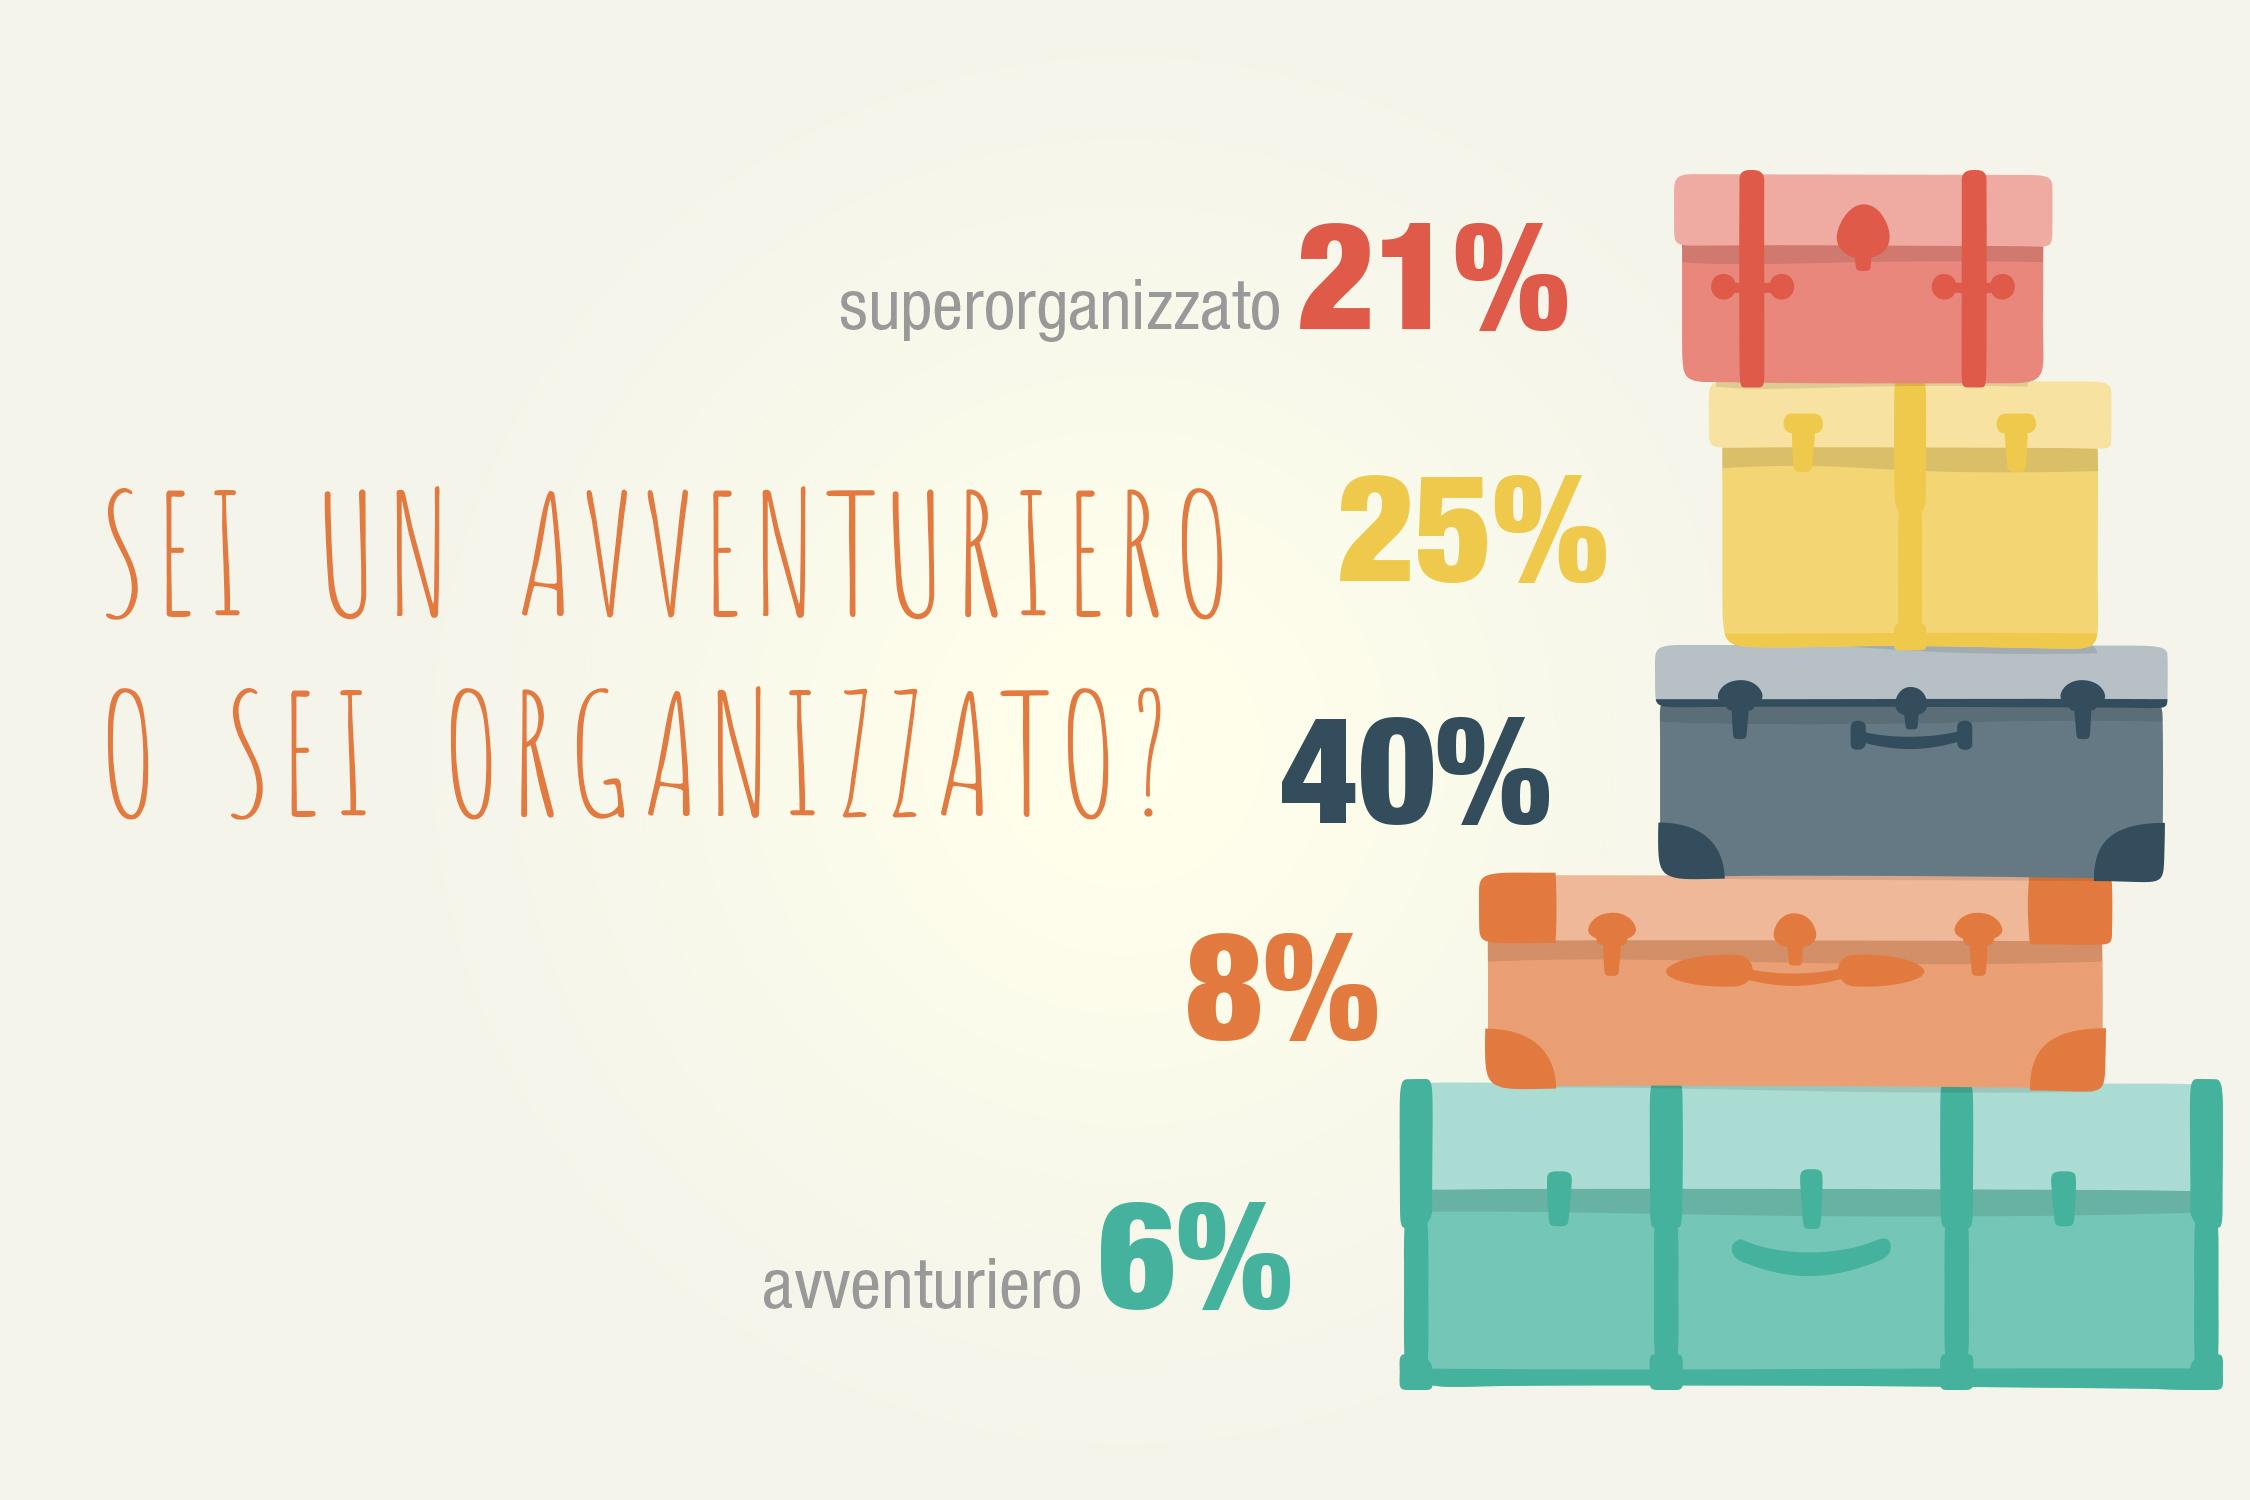 13 - avventuriero vs organizzato